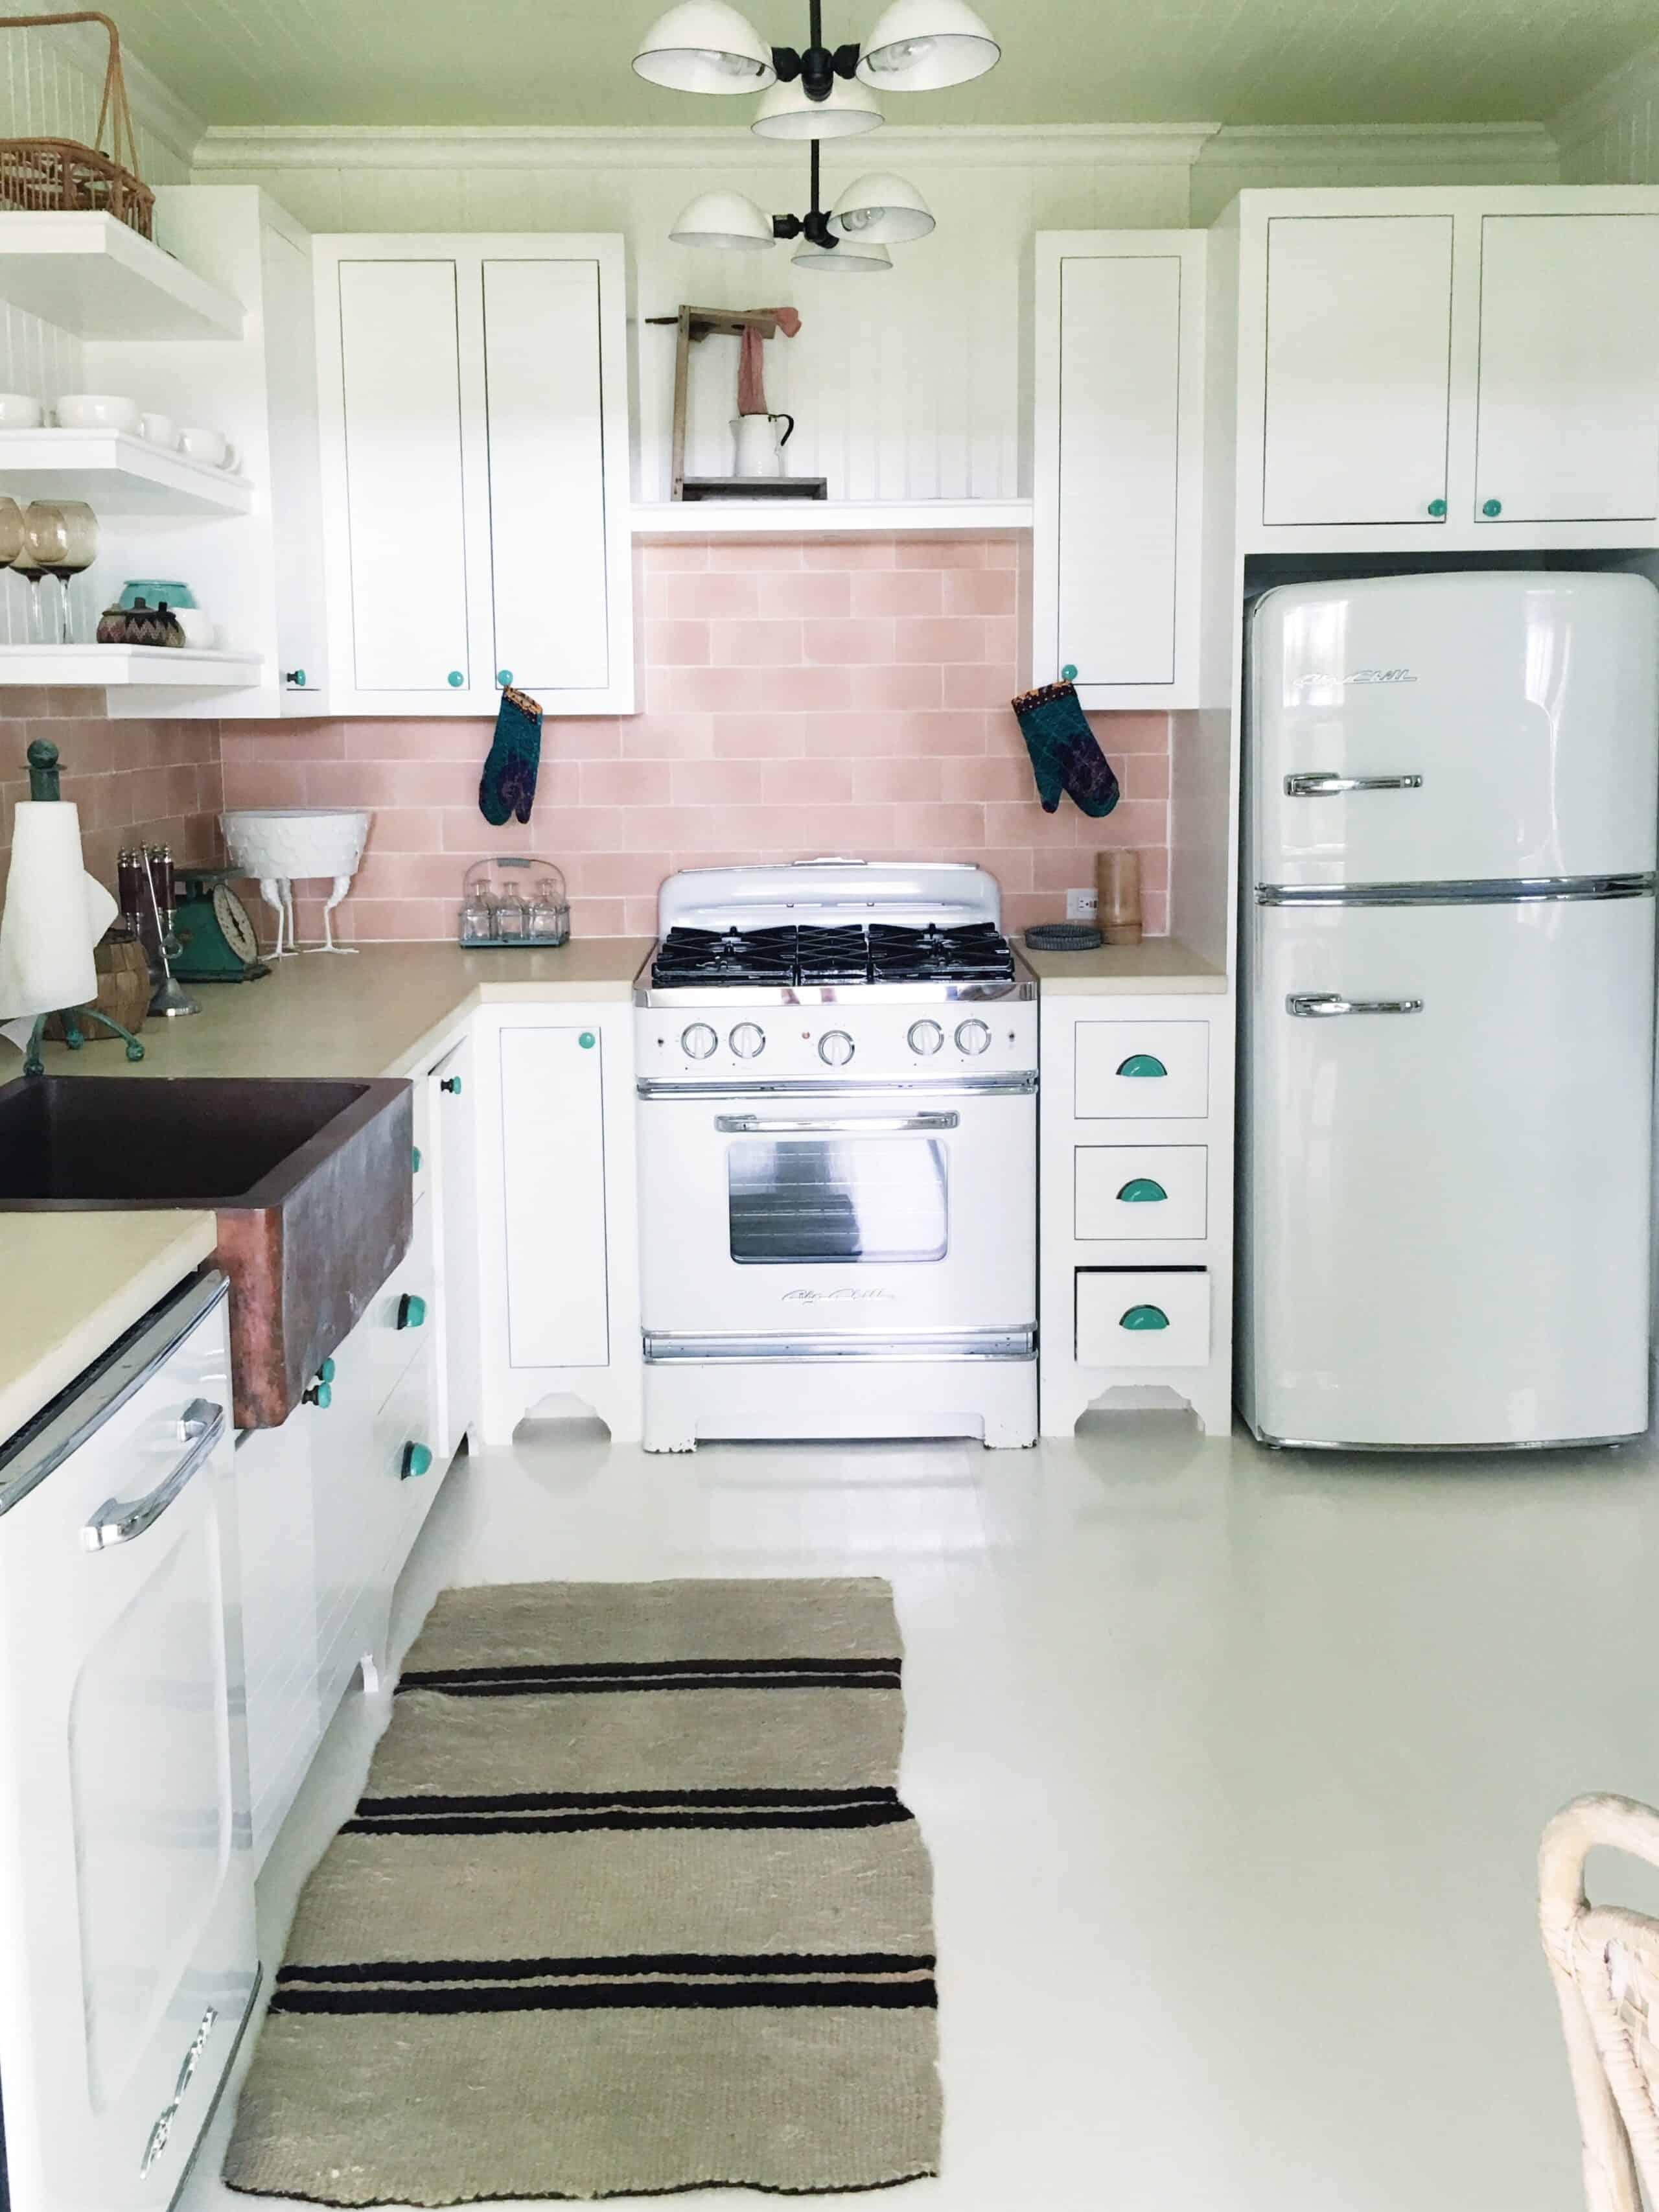 retro kitchen pink tile backsplash